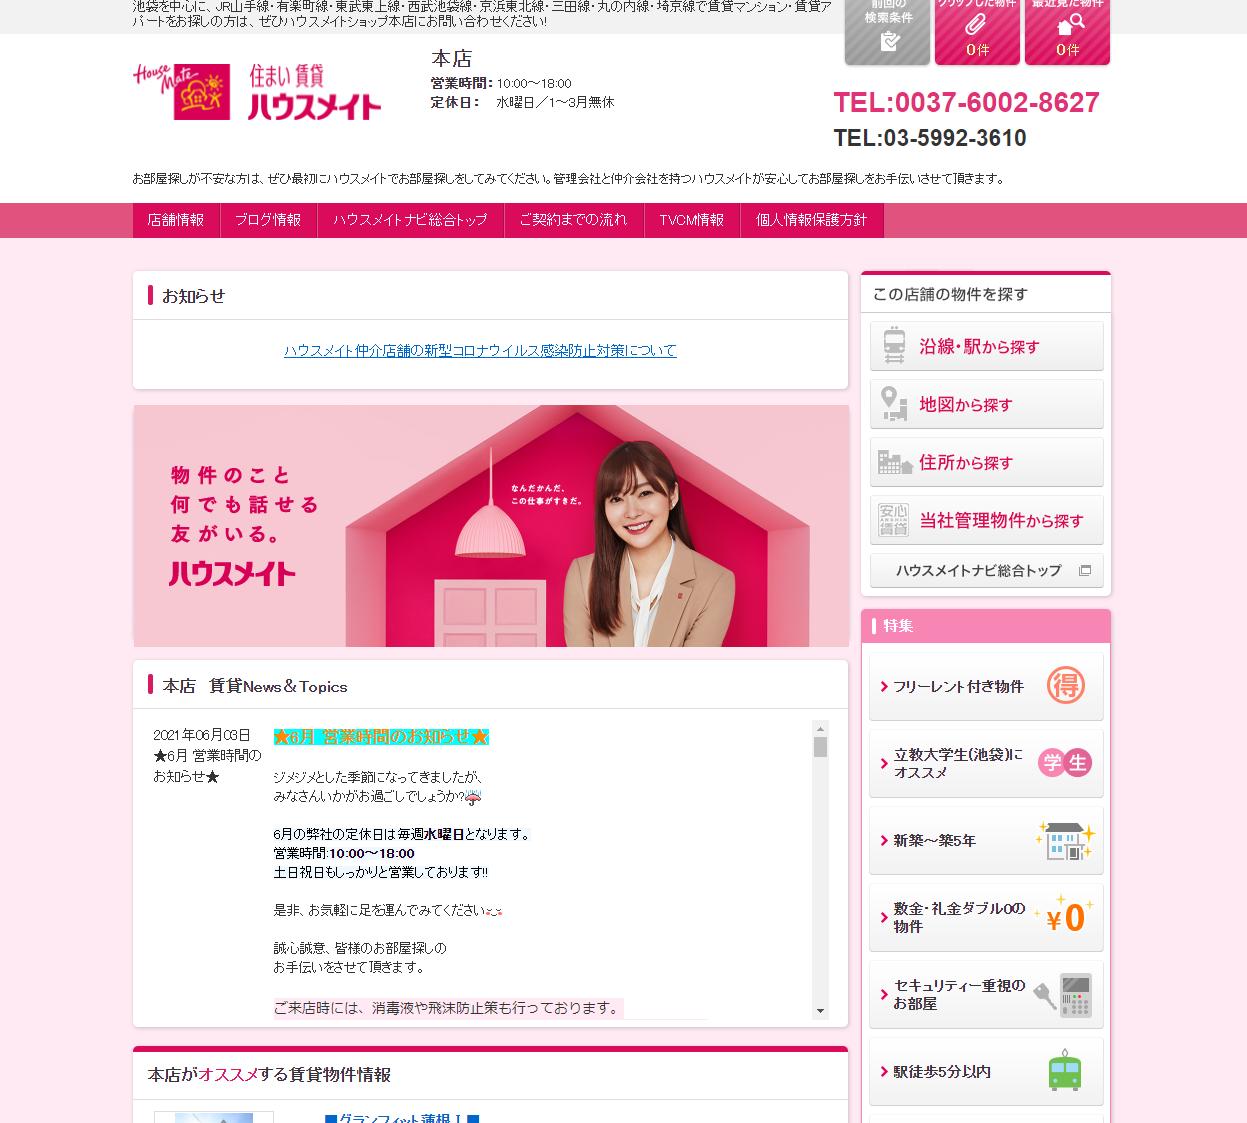 "<span class=""title"">(株)ハウスメイトショップ本店の口コミや評判</span>"